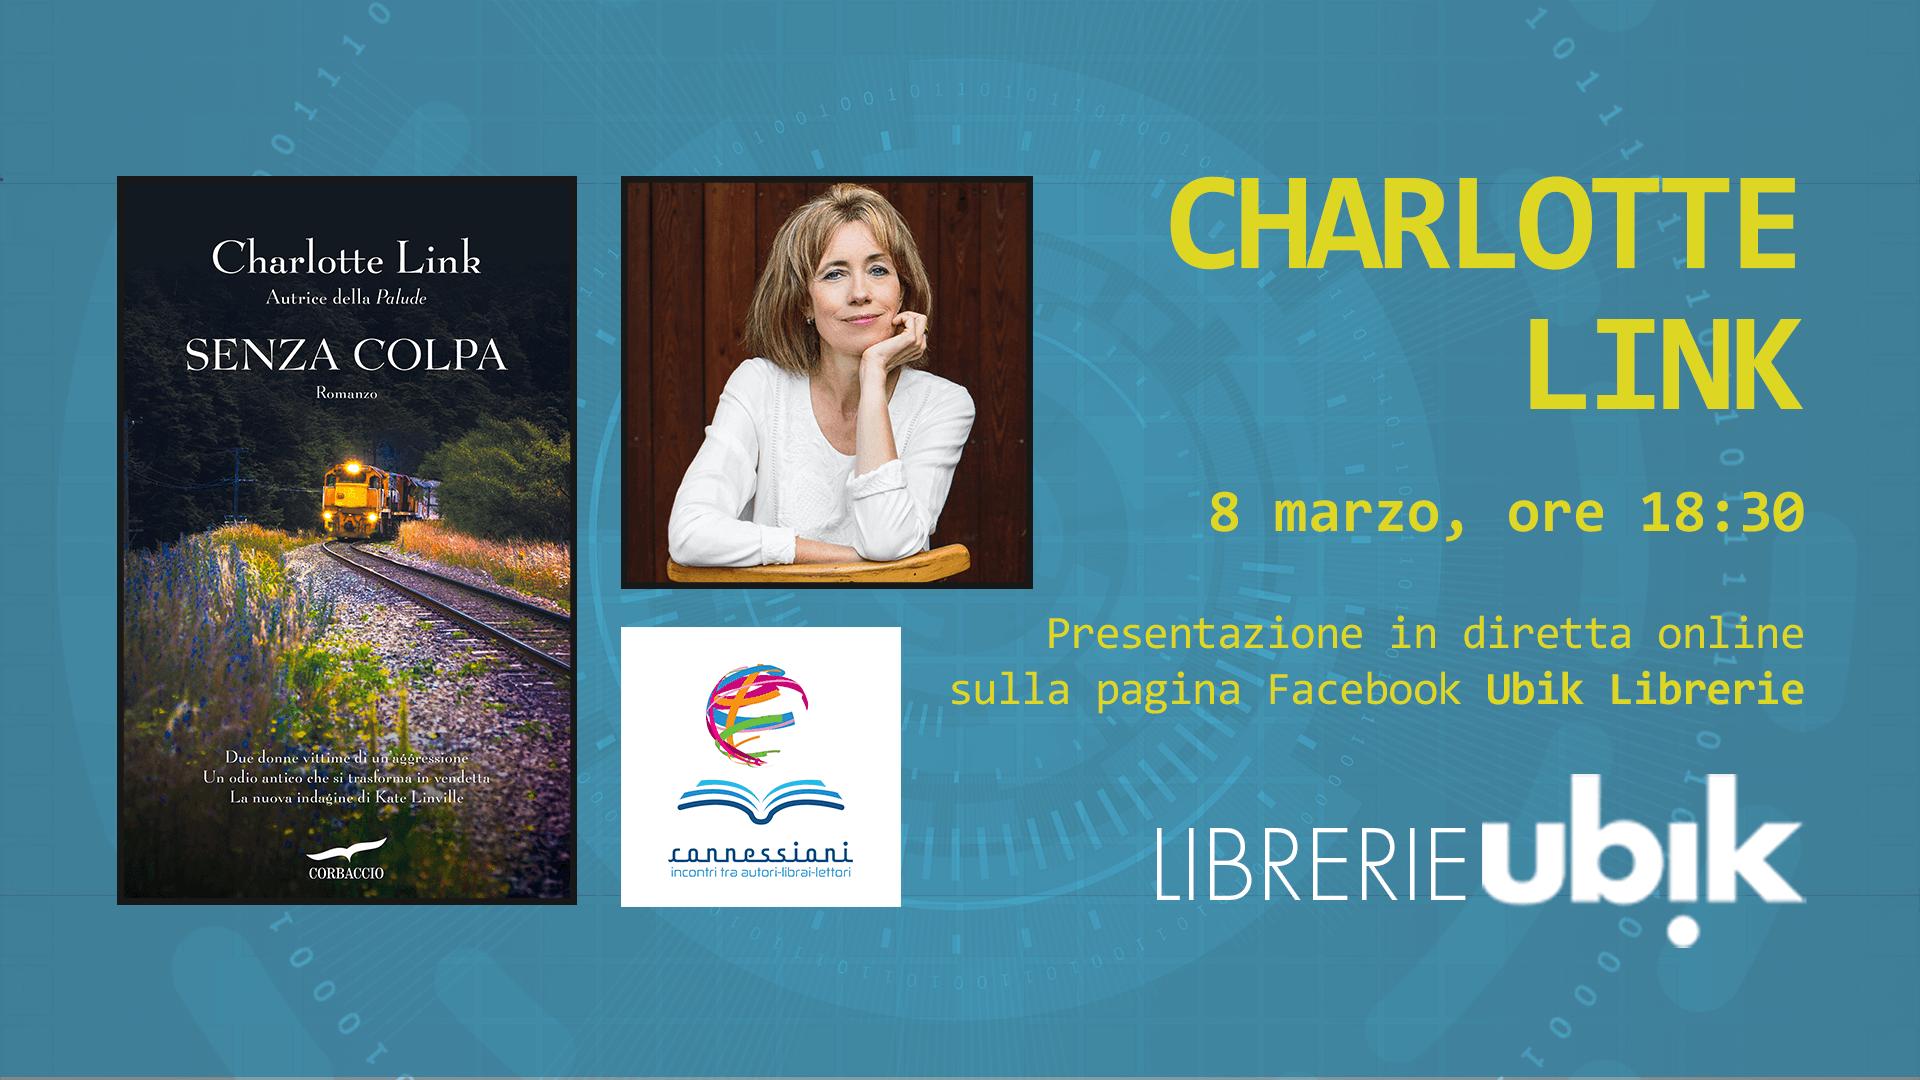 CHARLOTTE LINK presenta in diretta online